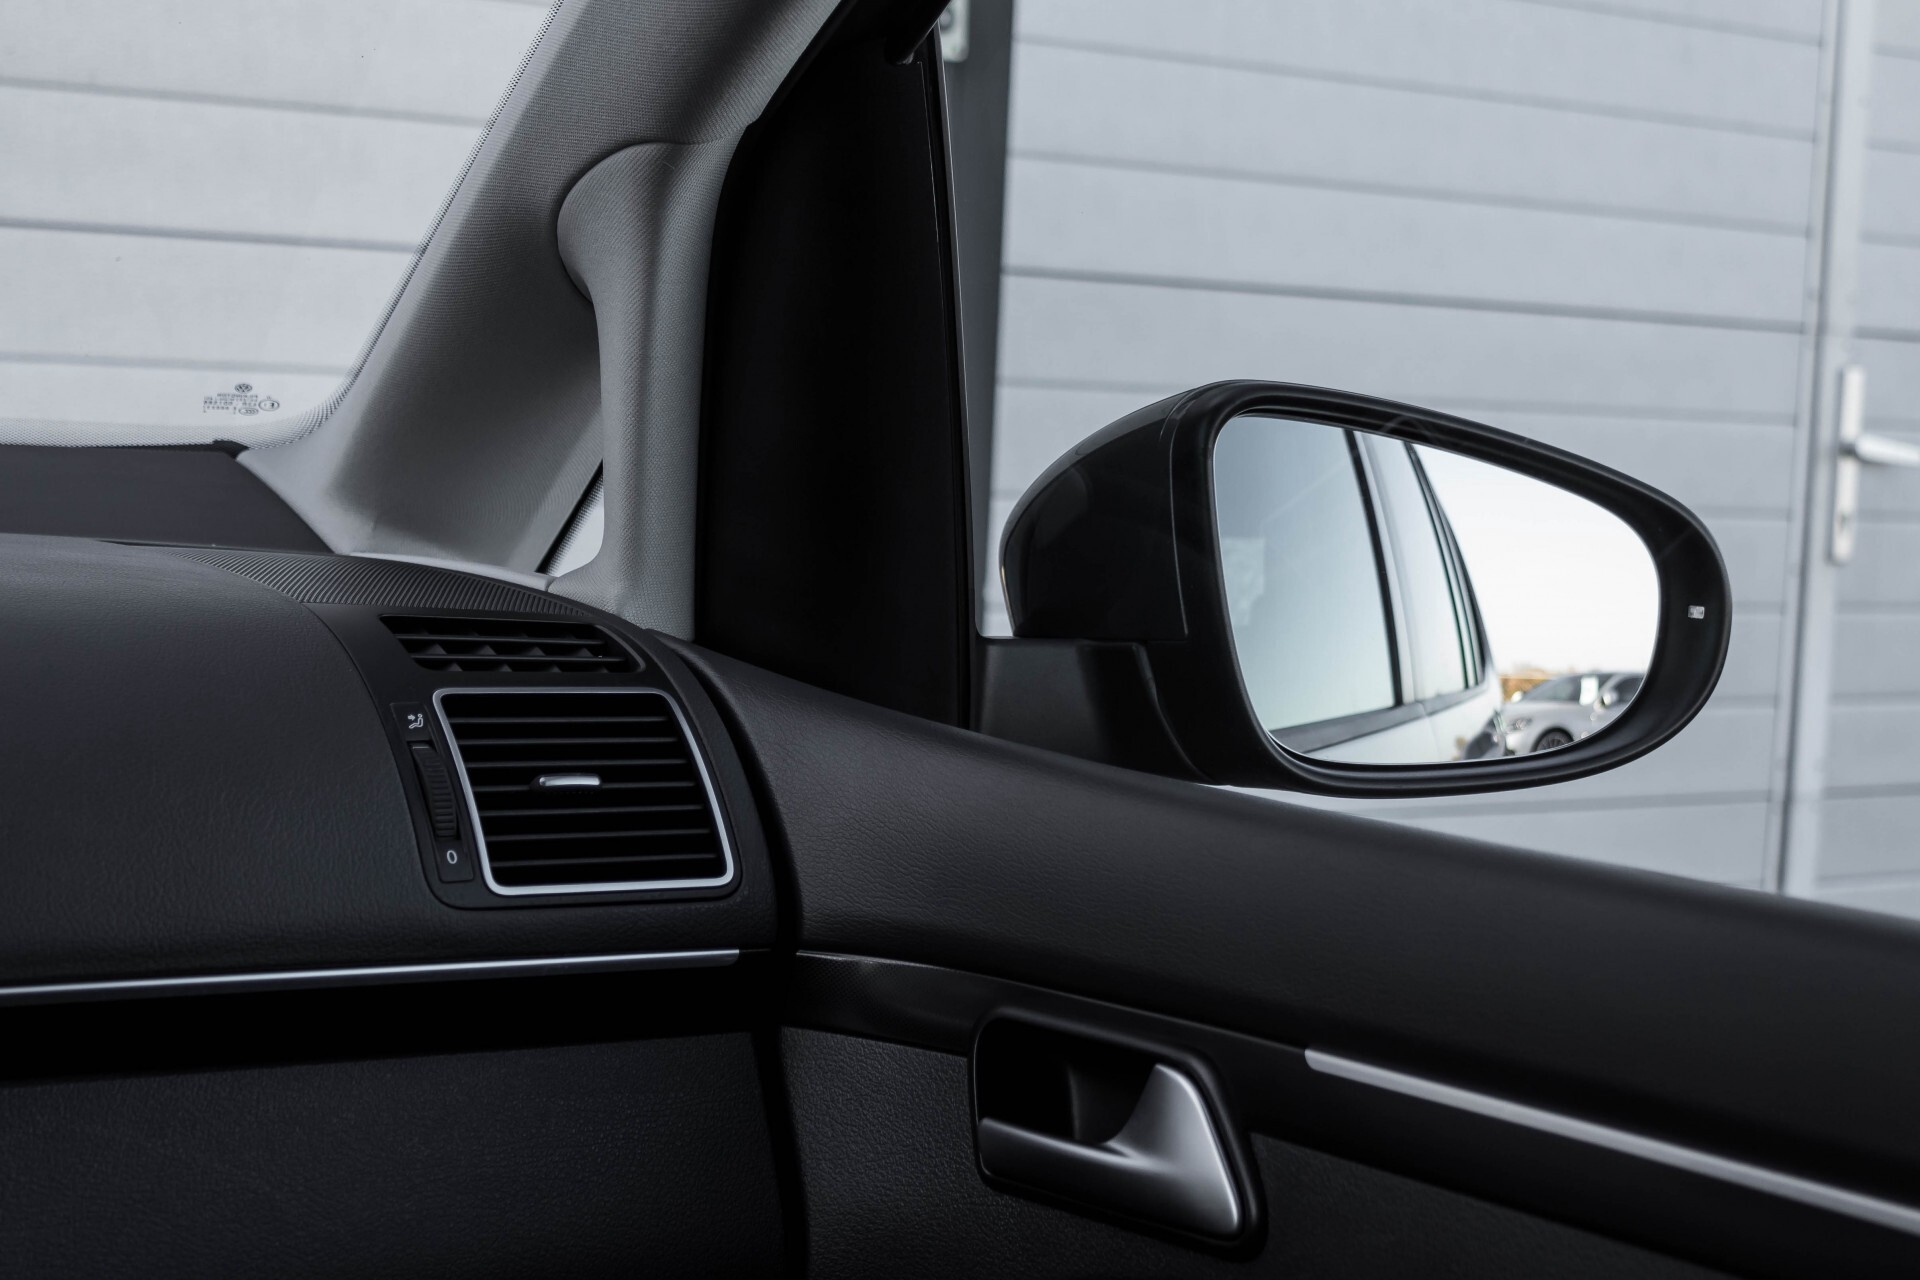 Volkswagen Touran 2.0 TDI Highline 7Persoons 177pk Panorama/Leder/Navi/Camera/Verw-Stln/Trhk/ECC/Xenon Aut Foto 38